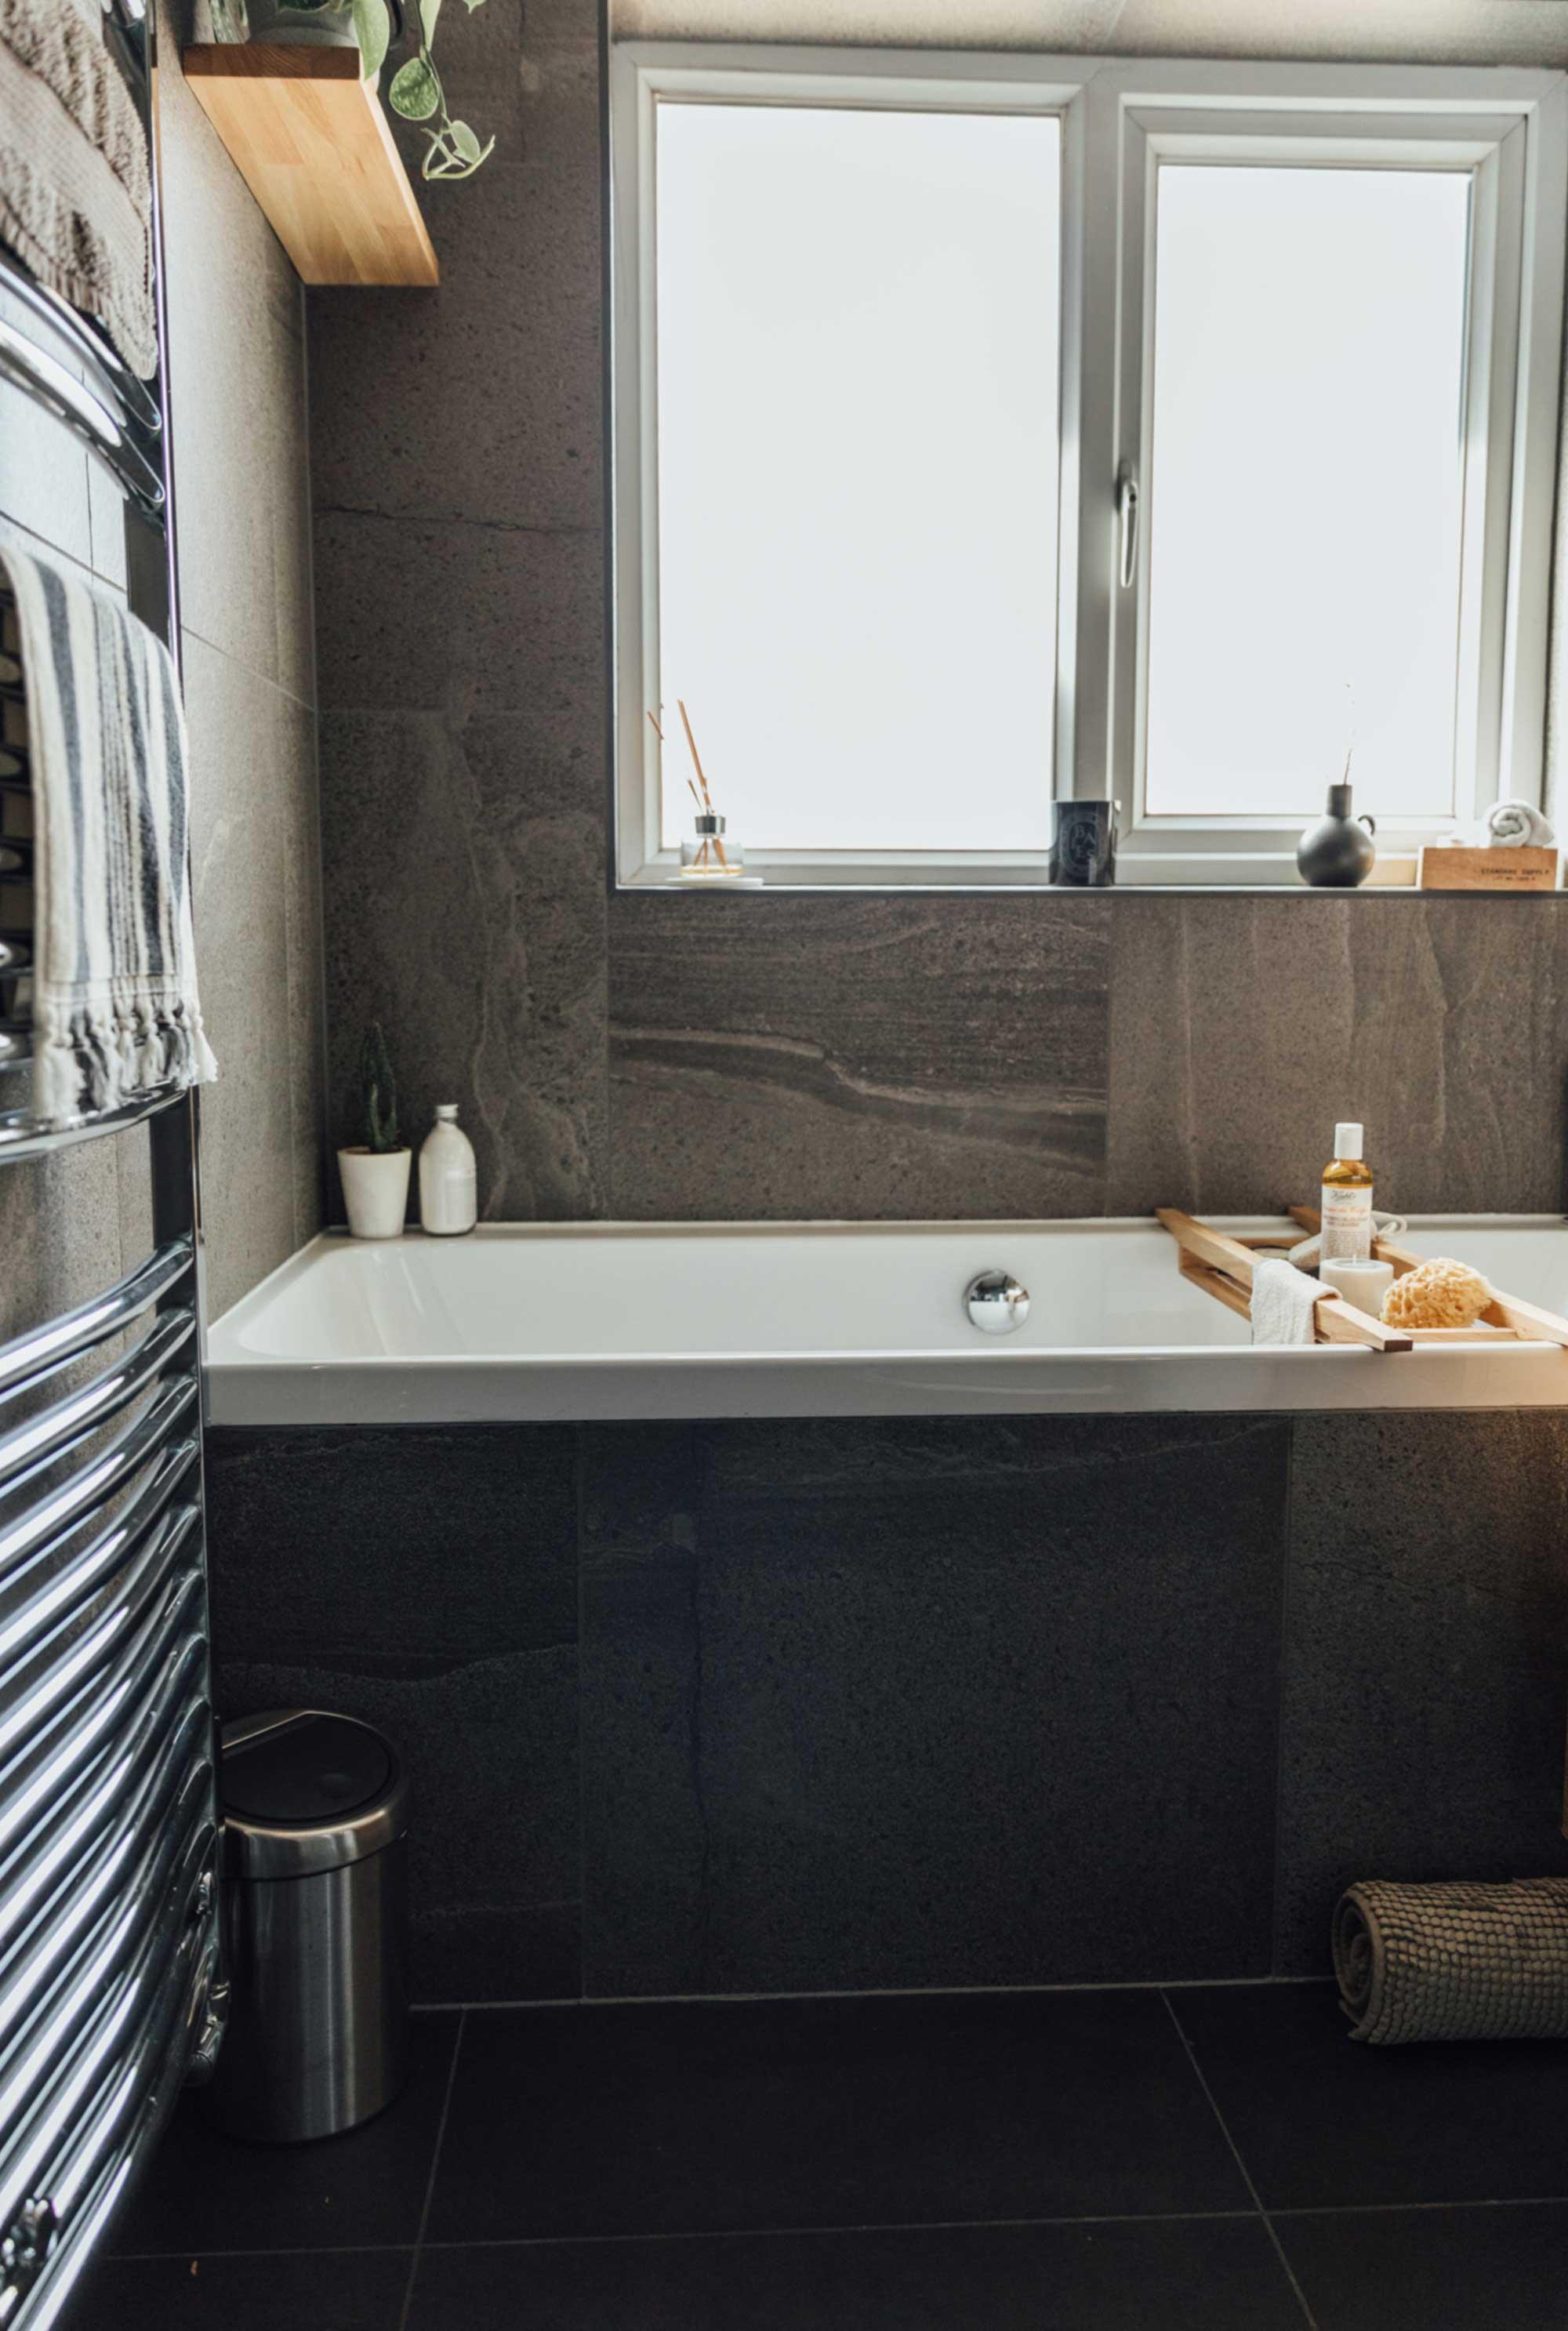 10 dark-tiled-bathroom-with-white-sanitaryware.jpg